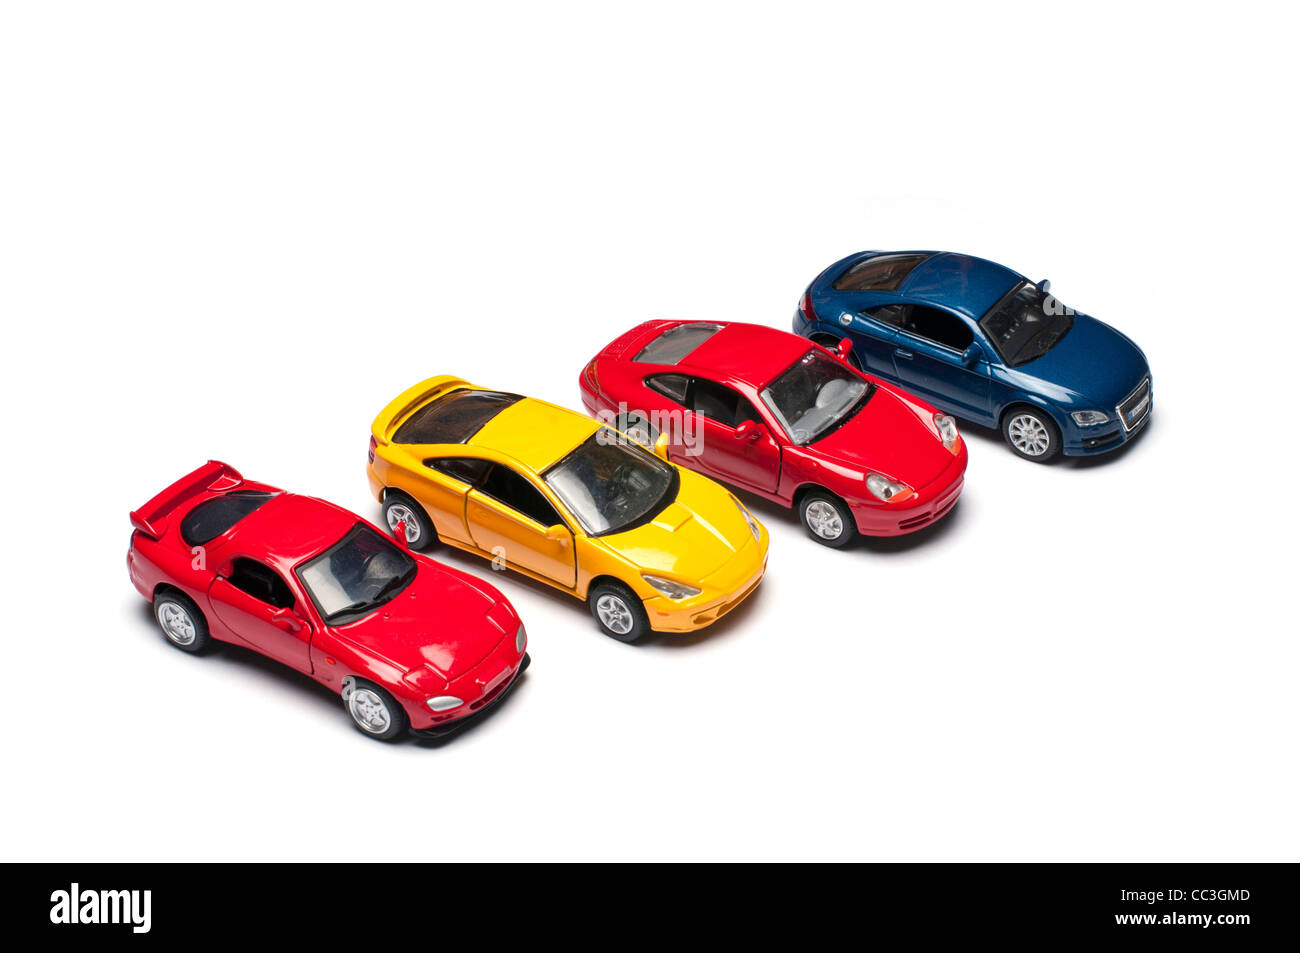 Quatre voitures de sport jouet Photo Stock